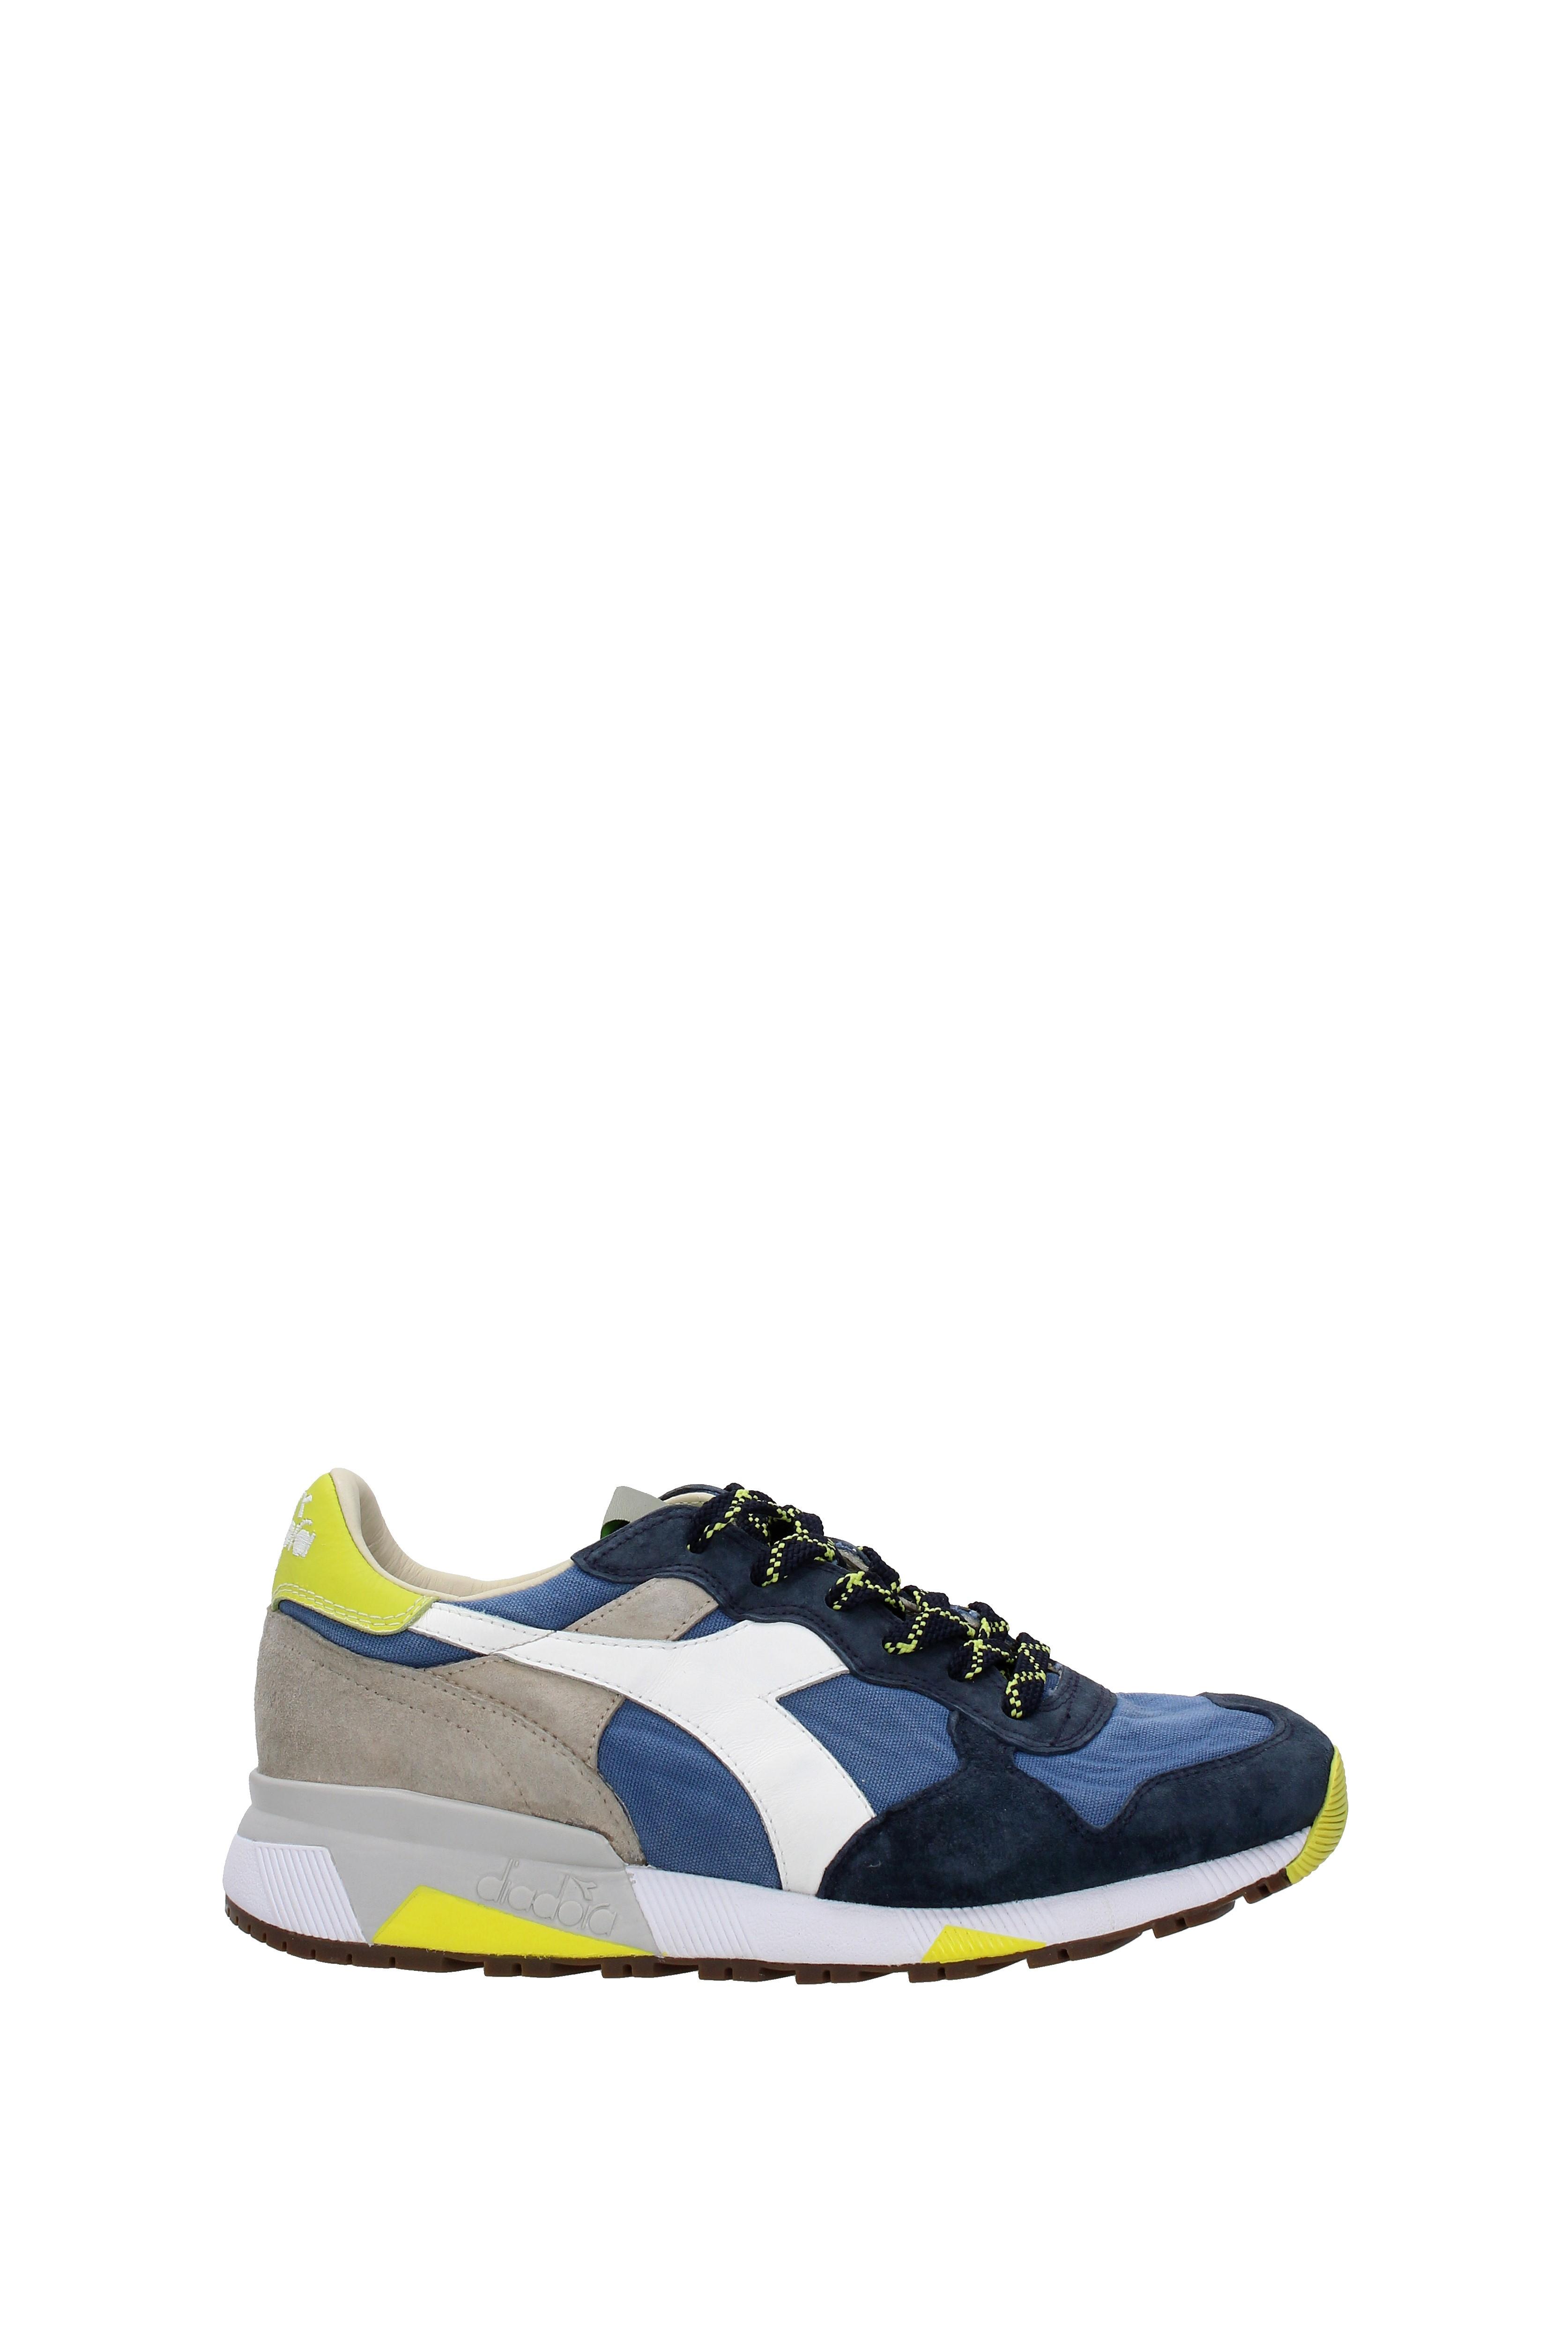 Sneakers Diadora Diadora Diadora Heritage Herren - Stoff (20116130401) 7352c7